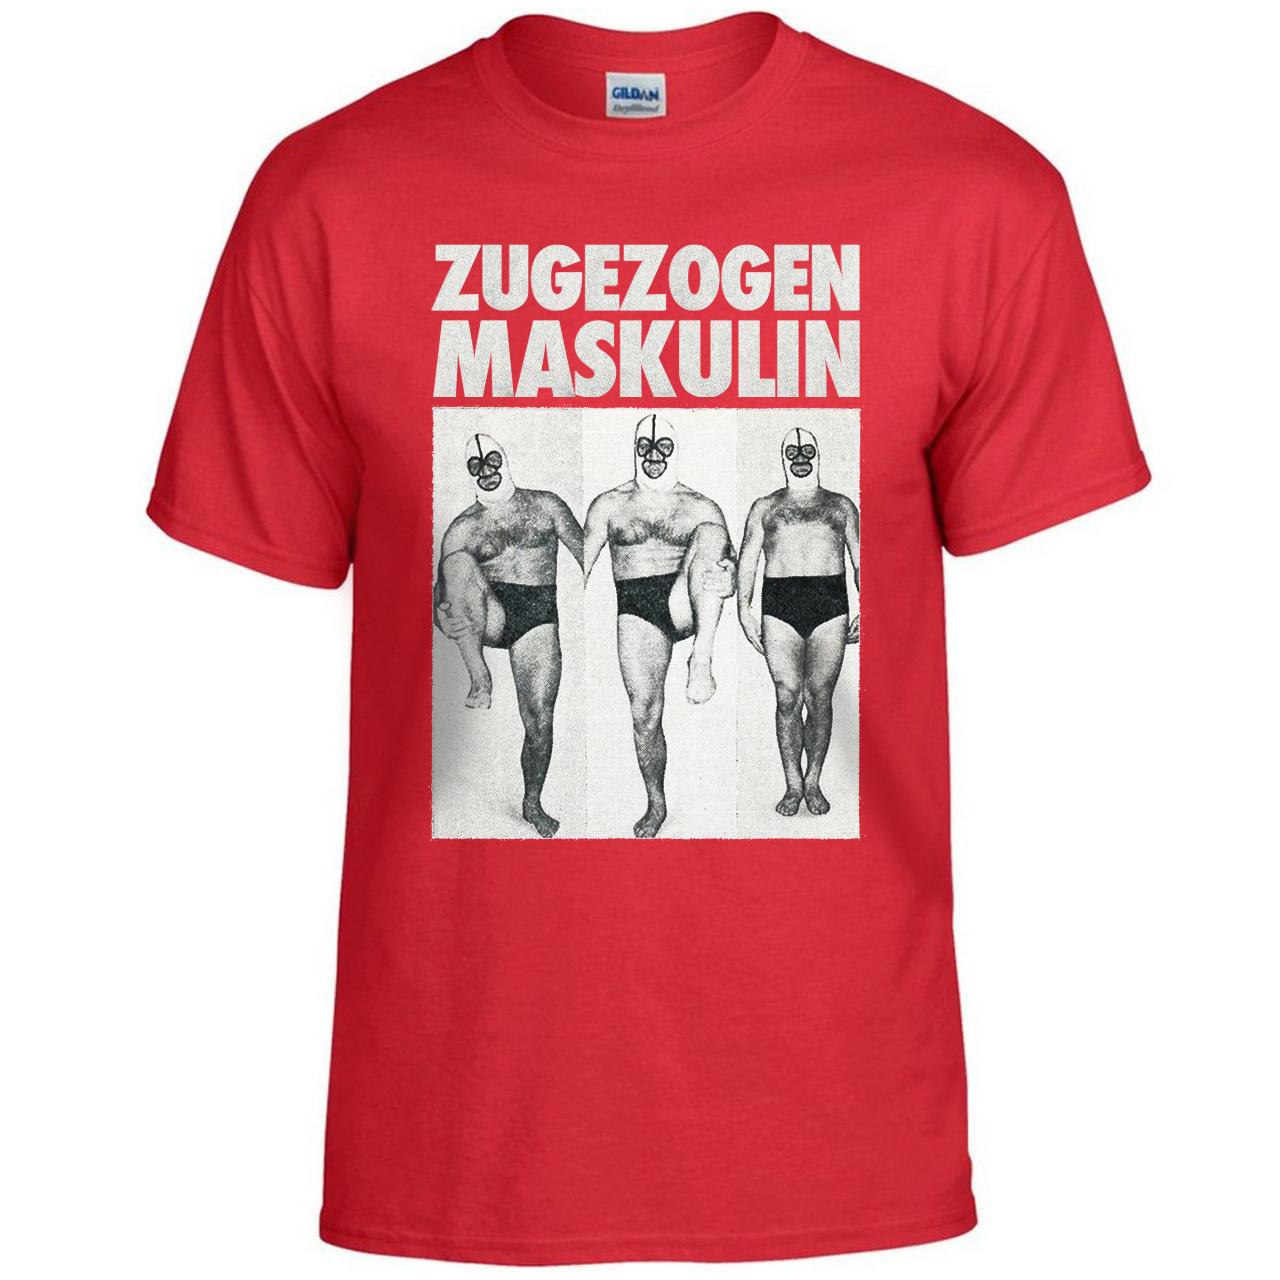 Zugezogen Maskulin ZM Aggro Wrestler T-Shirt Red